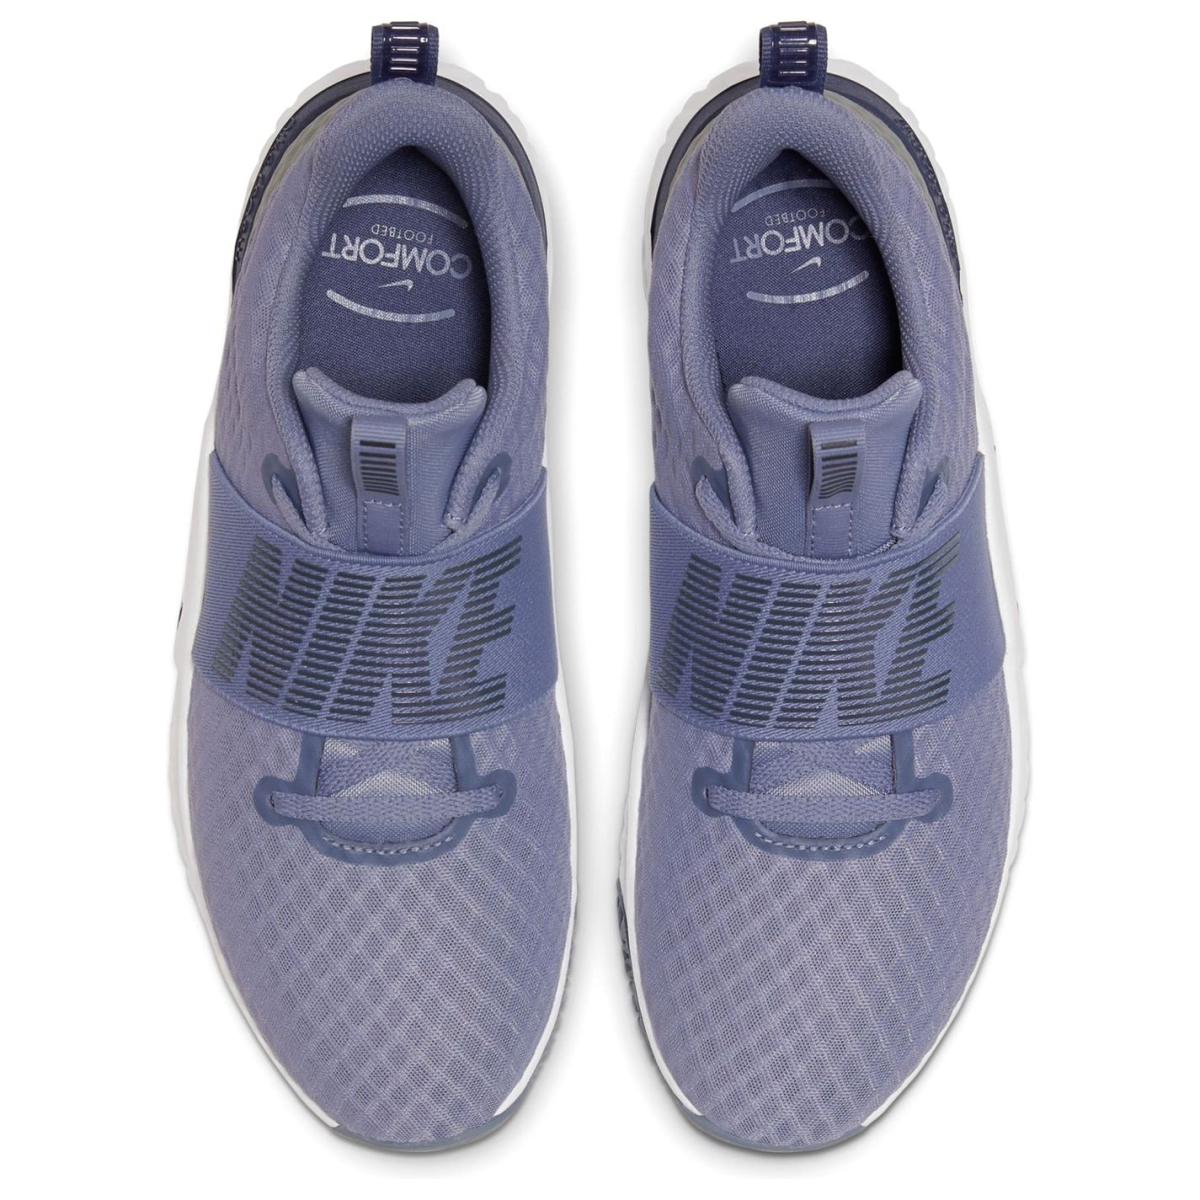 Nike Renew In Season Tr 9 Turnschuhe Damen Sneaker Sportschuhe Laufschuhe 3011